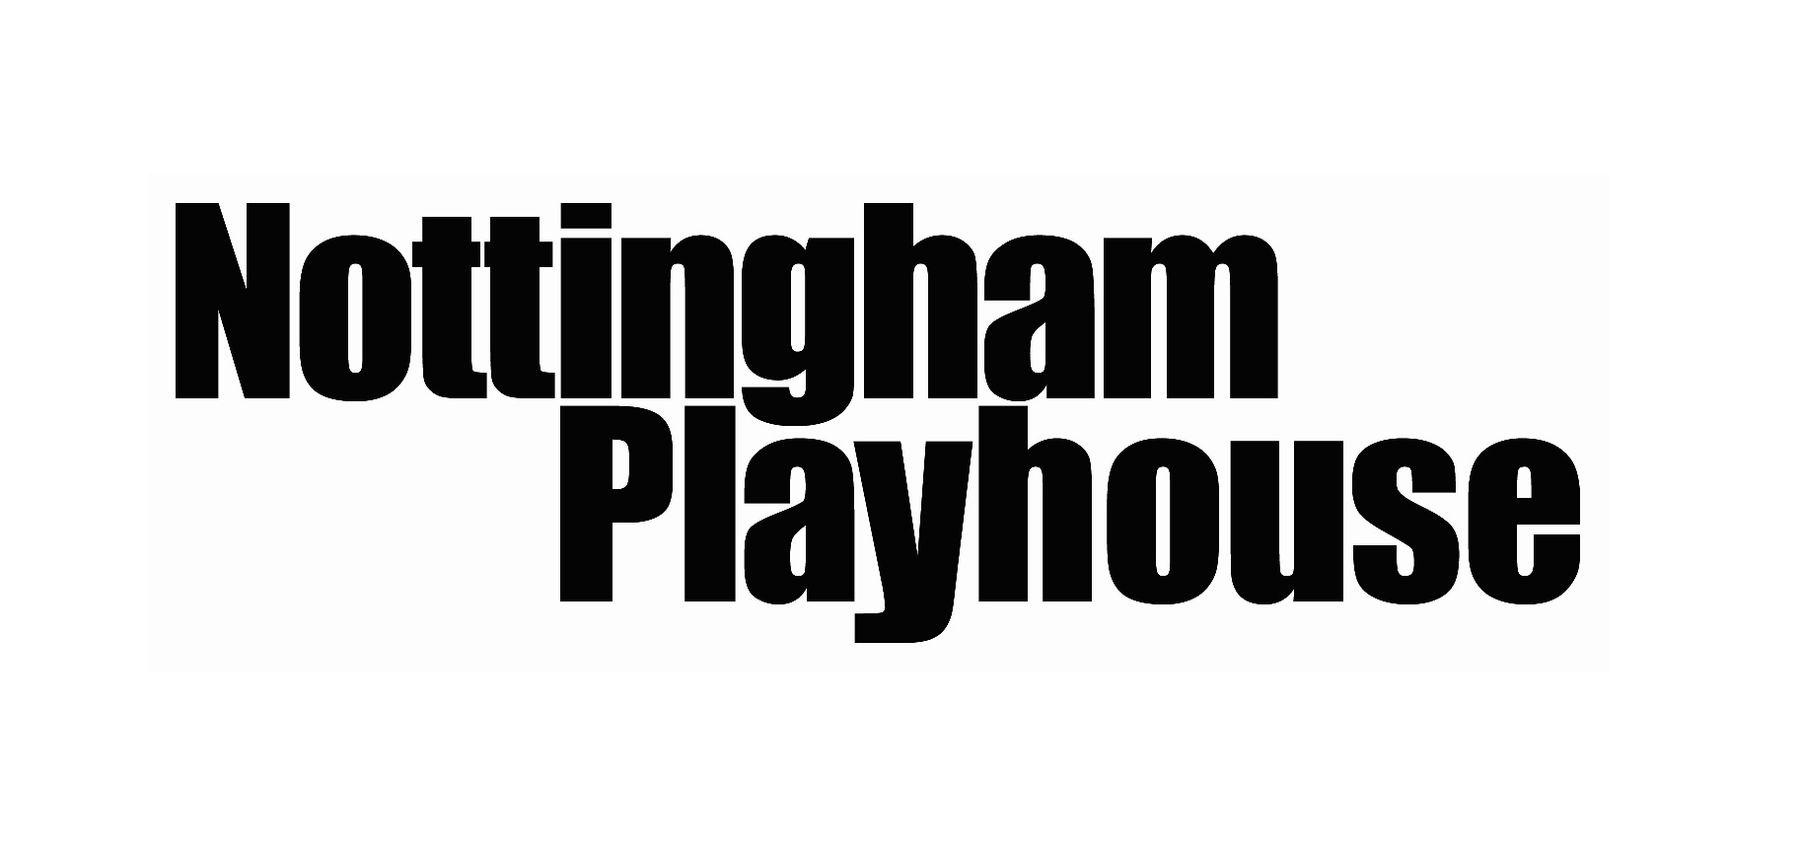 Nottingham Playhouse logo